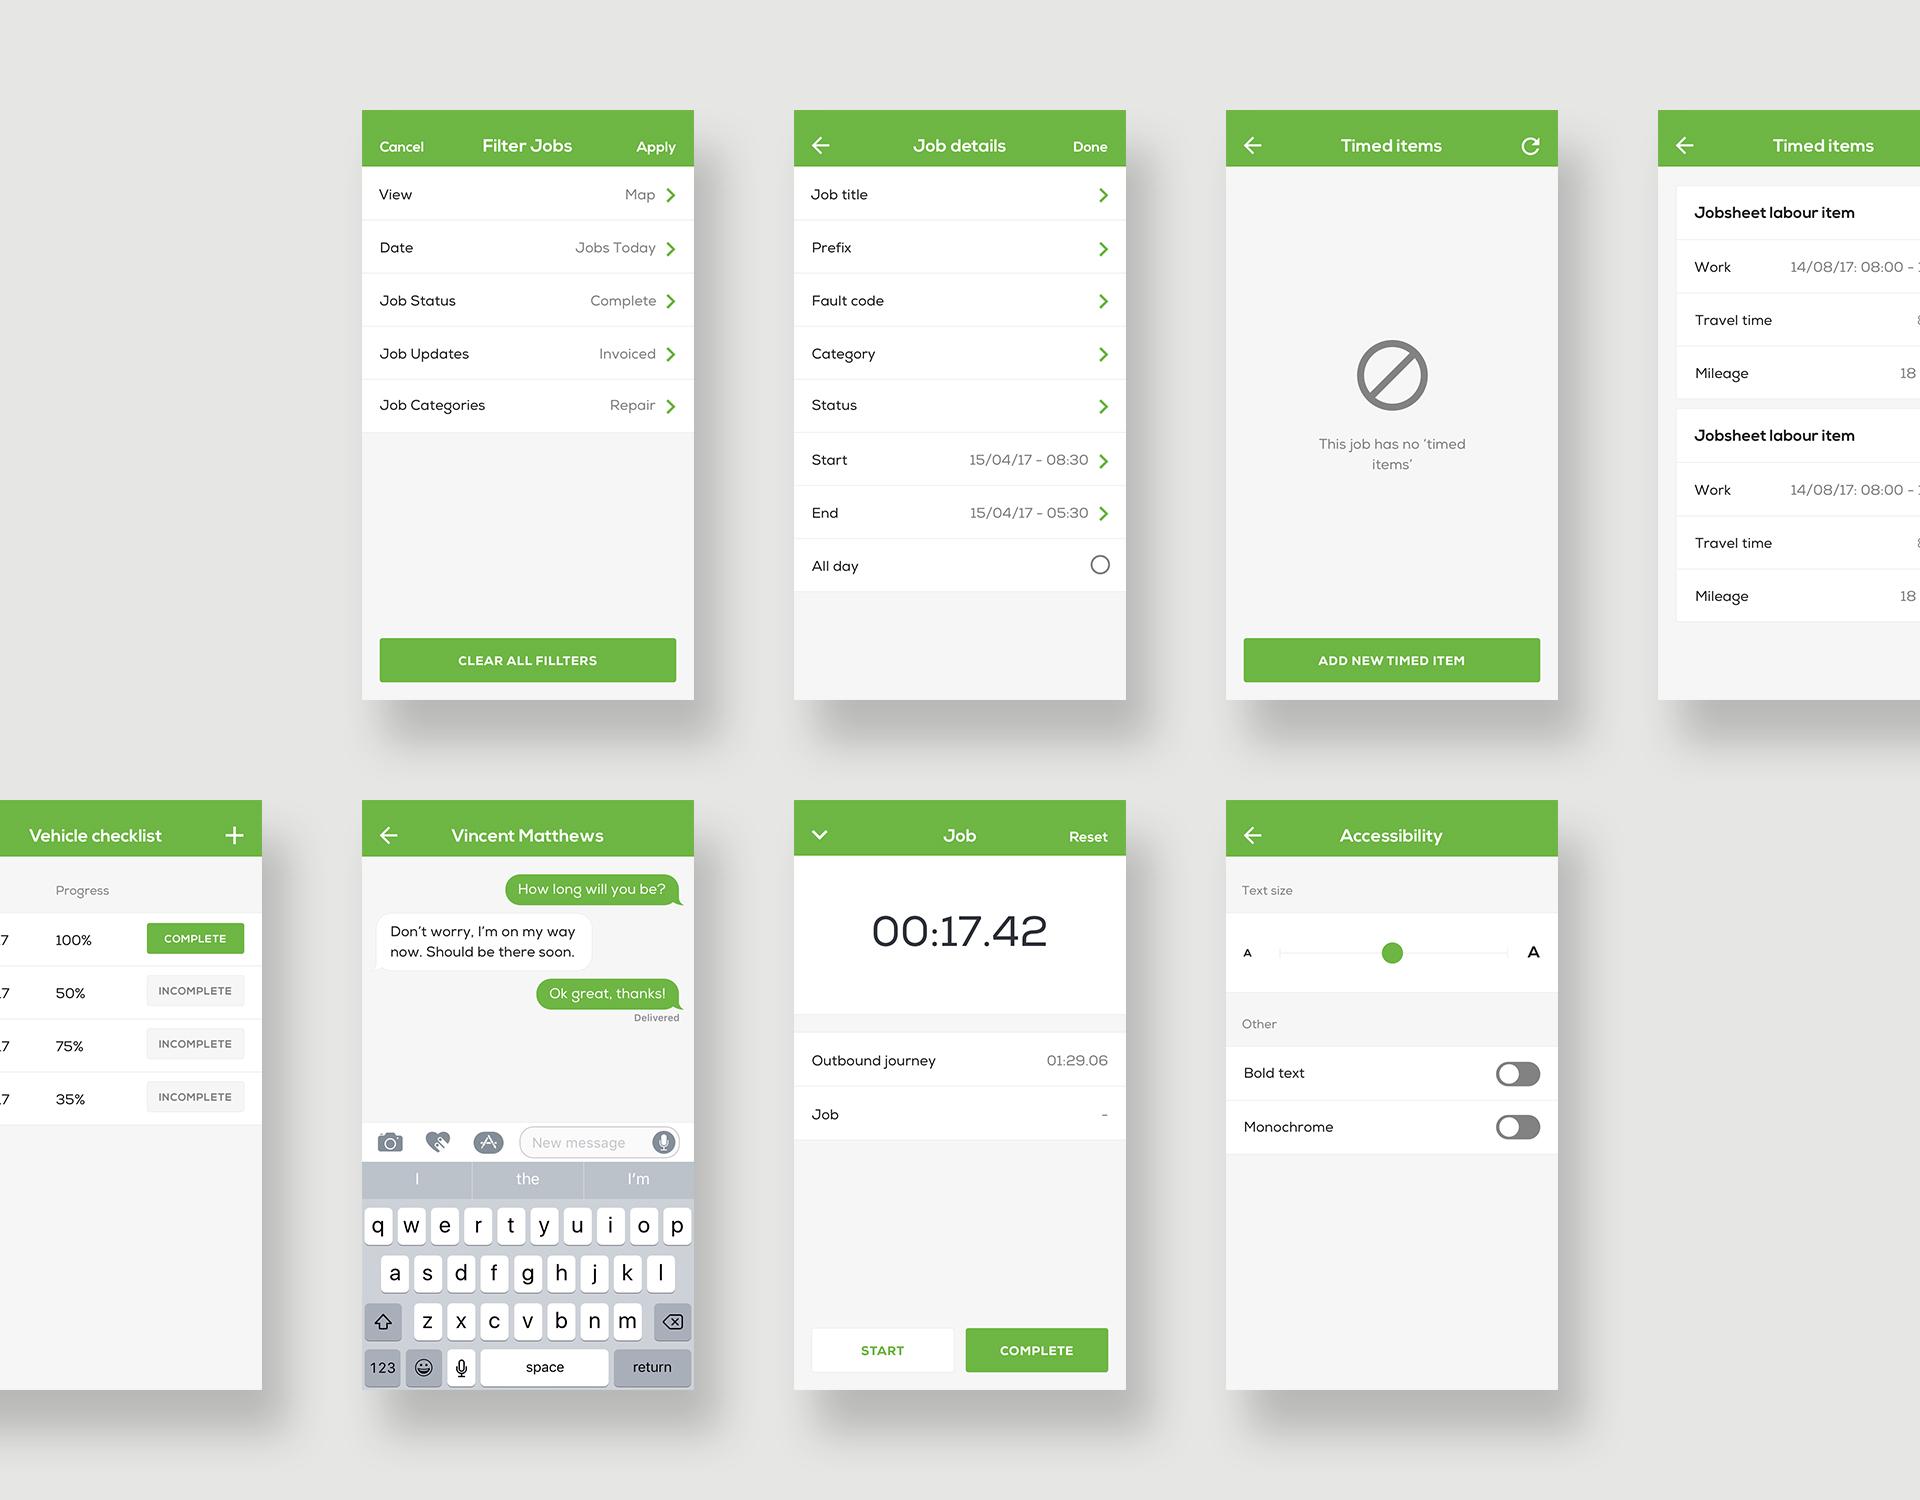 User Interface Designs for Clik Jobs